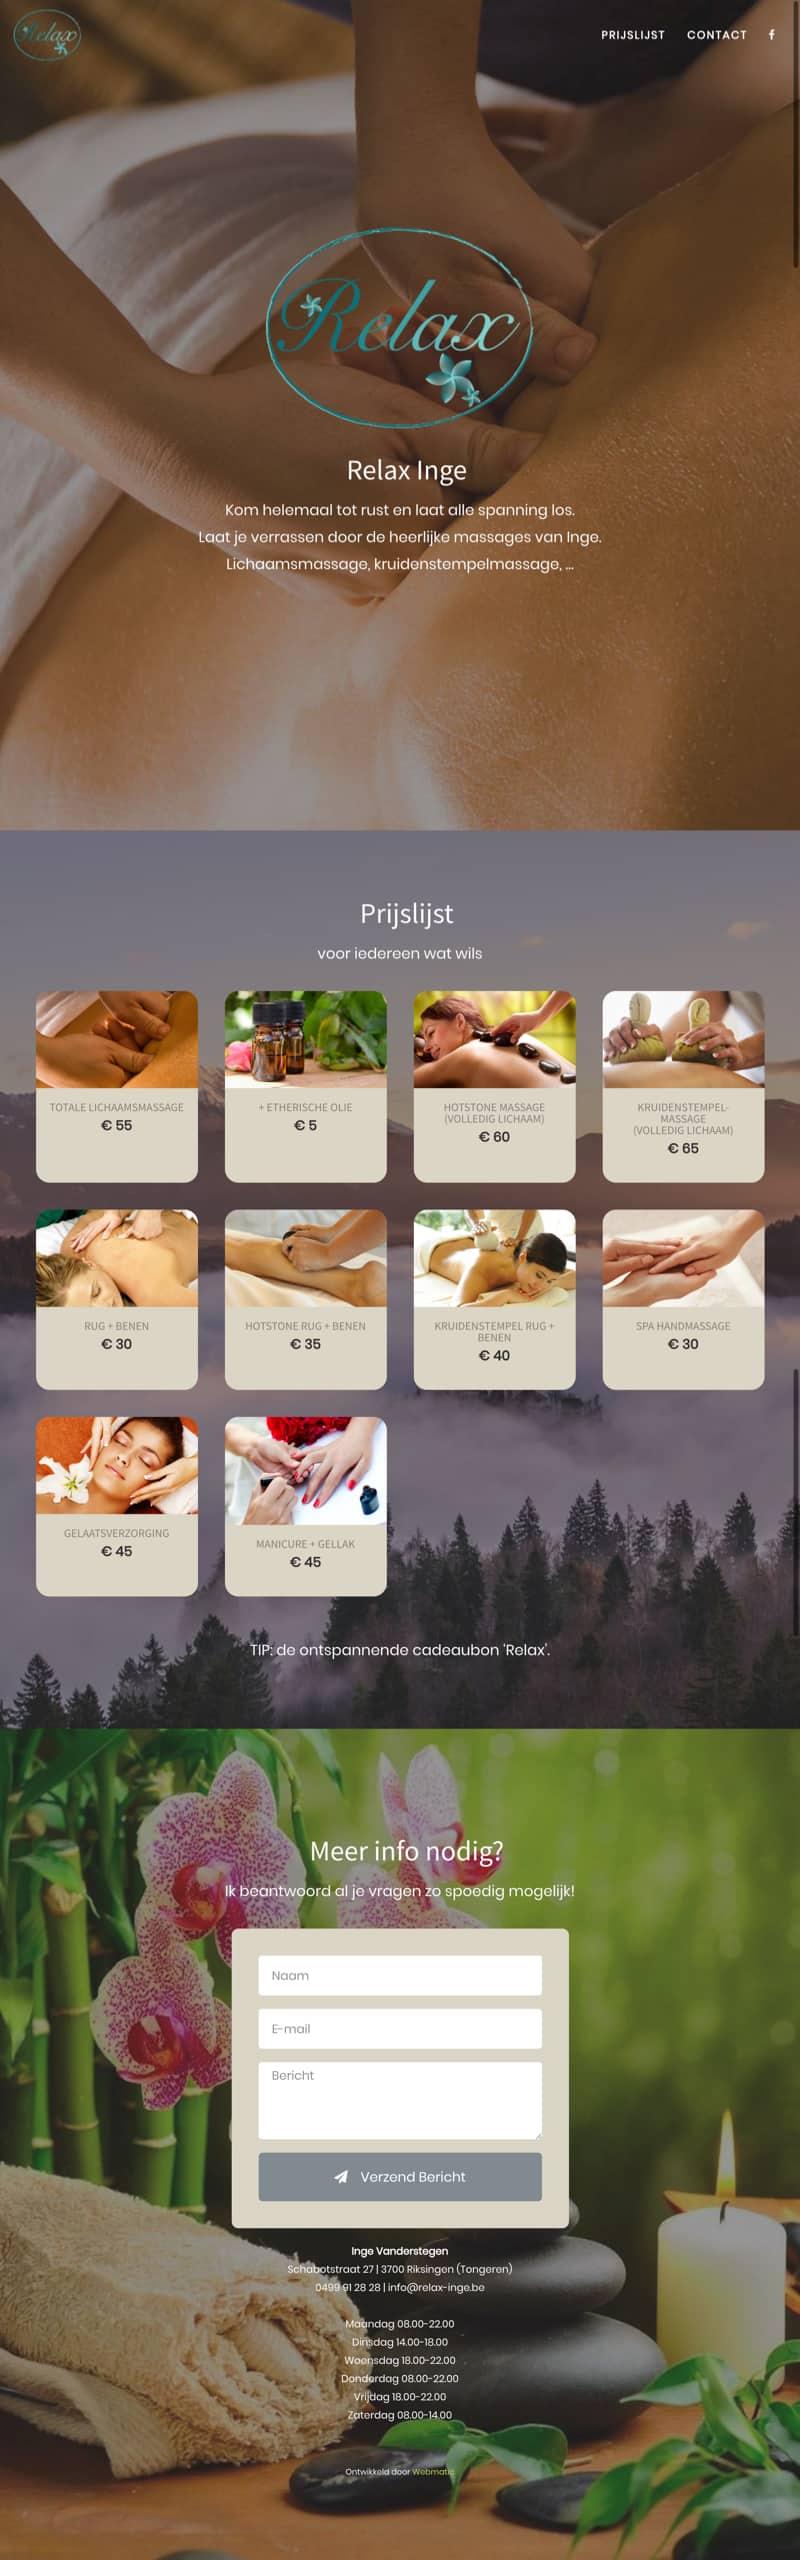 webmatic-portfolio-relax-inge-21044-800